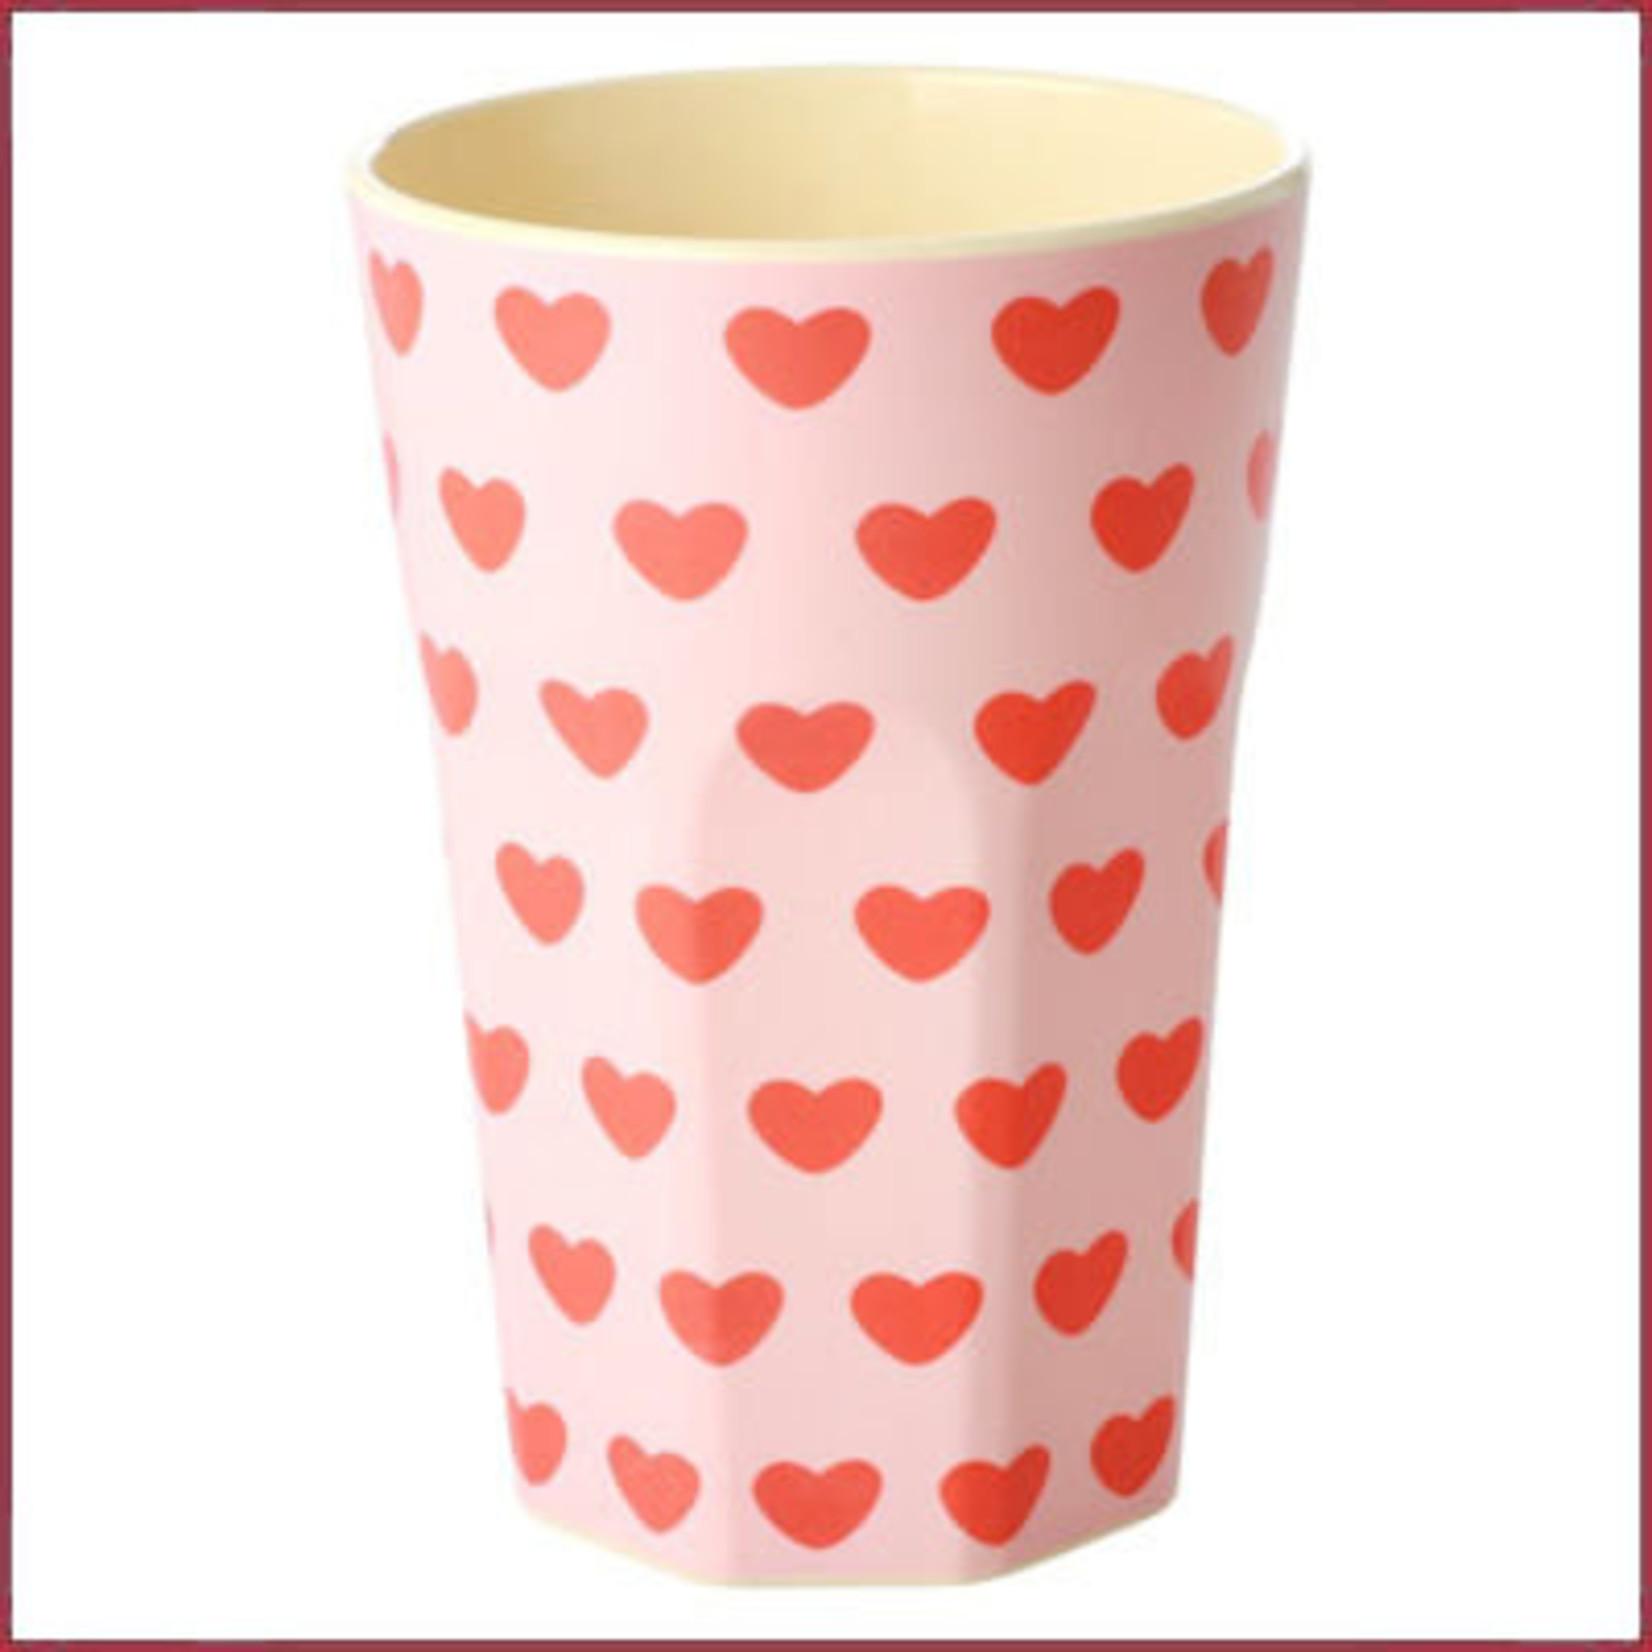 Rice Rice Cup Tall Sweet Hearts Print